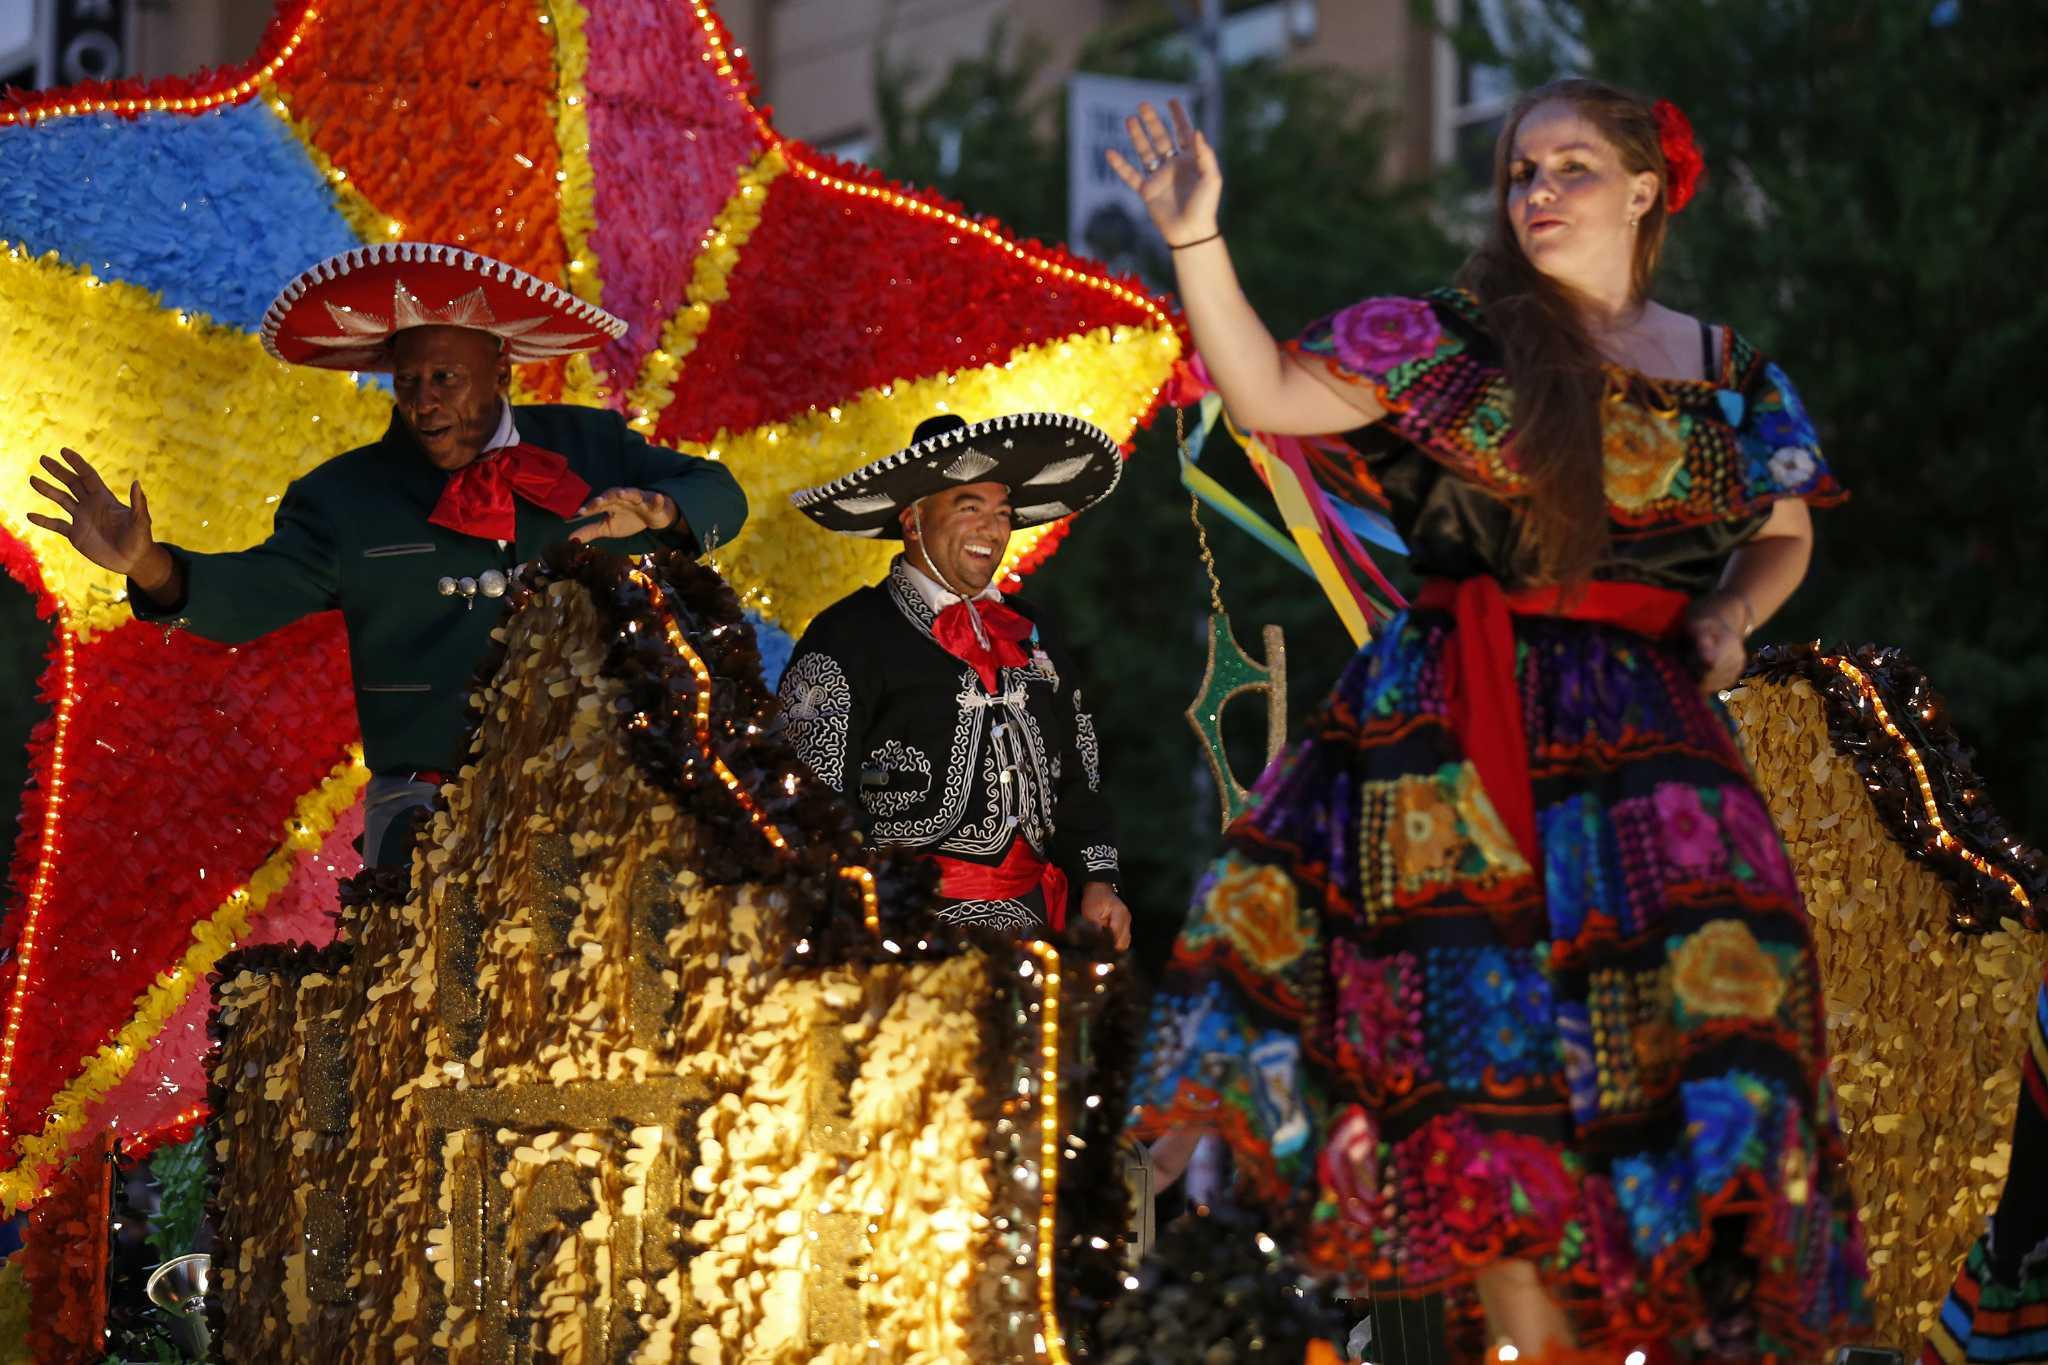 Fiesta Flambeau Parade Lights Up Downtown San Antonio